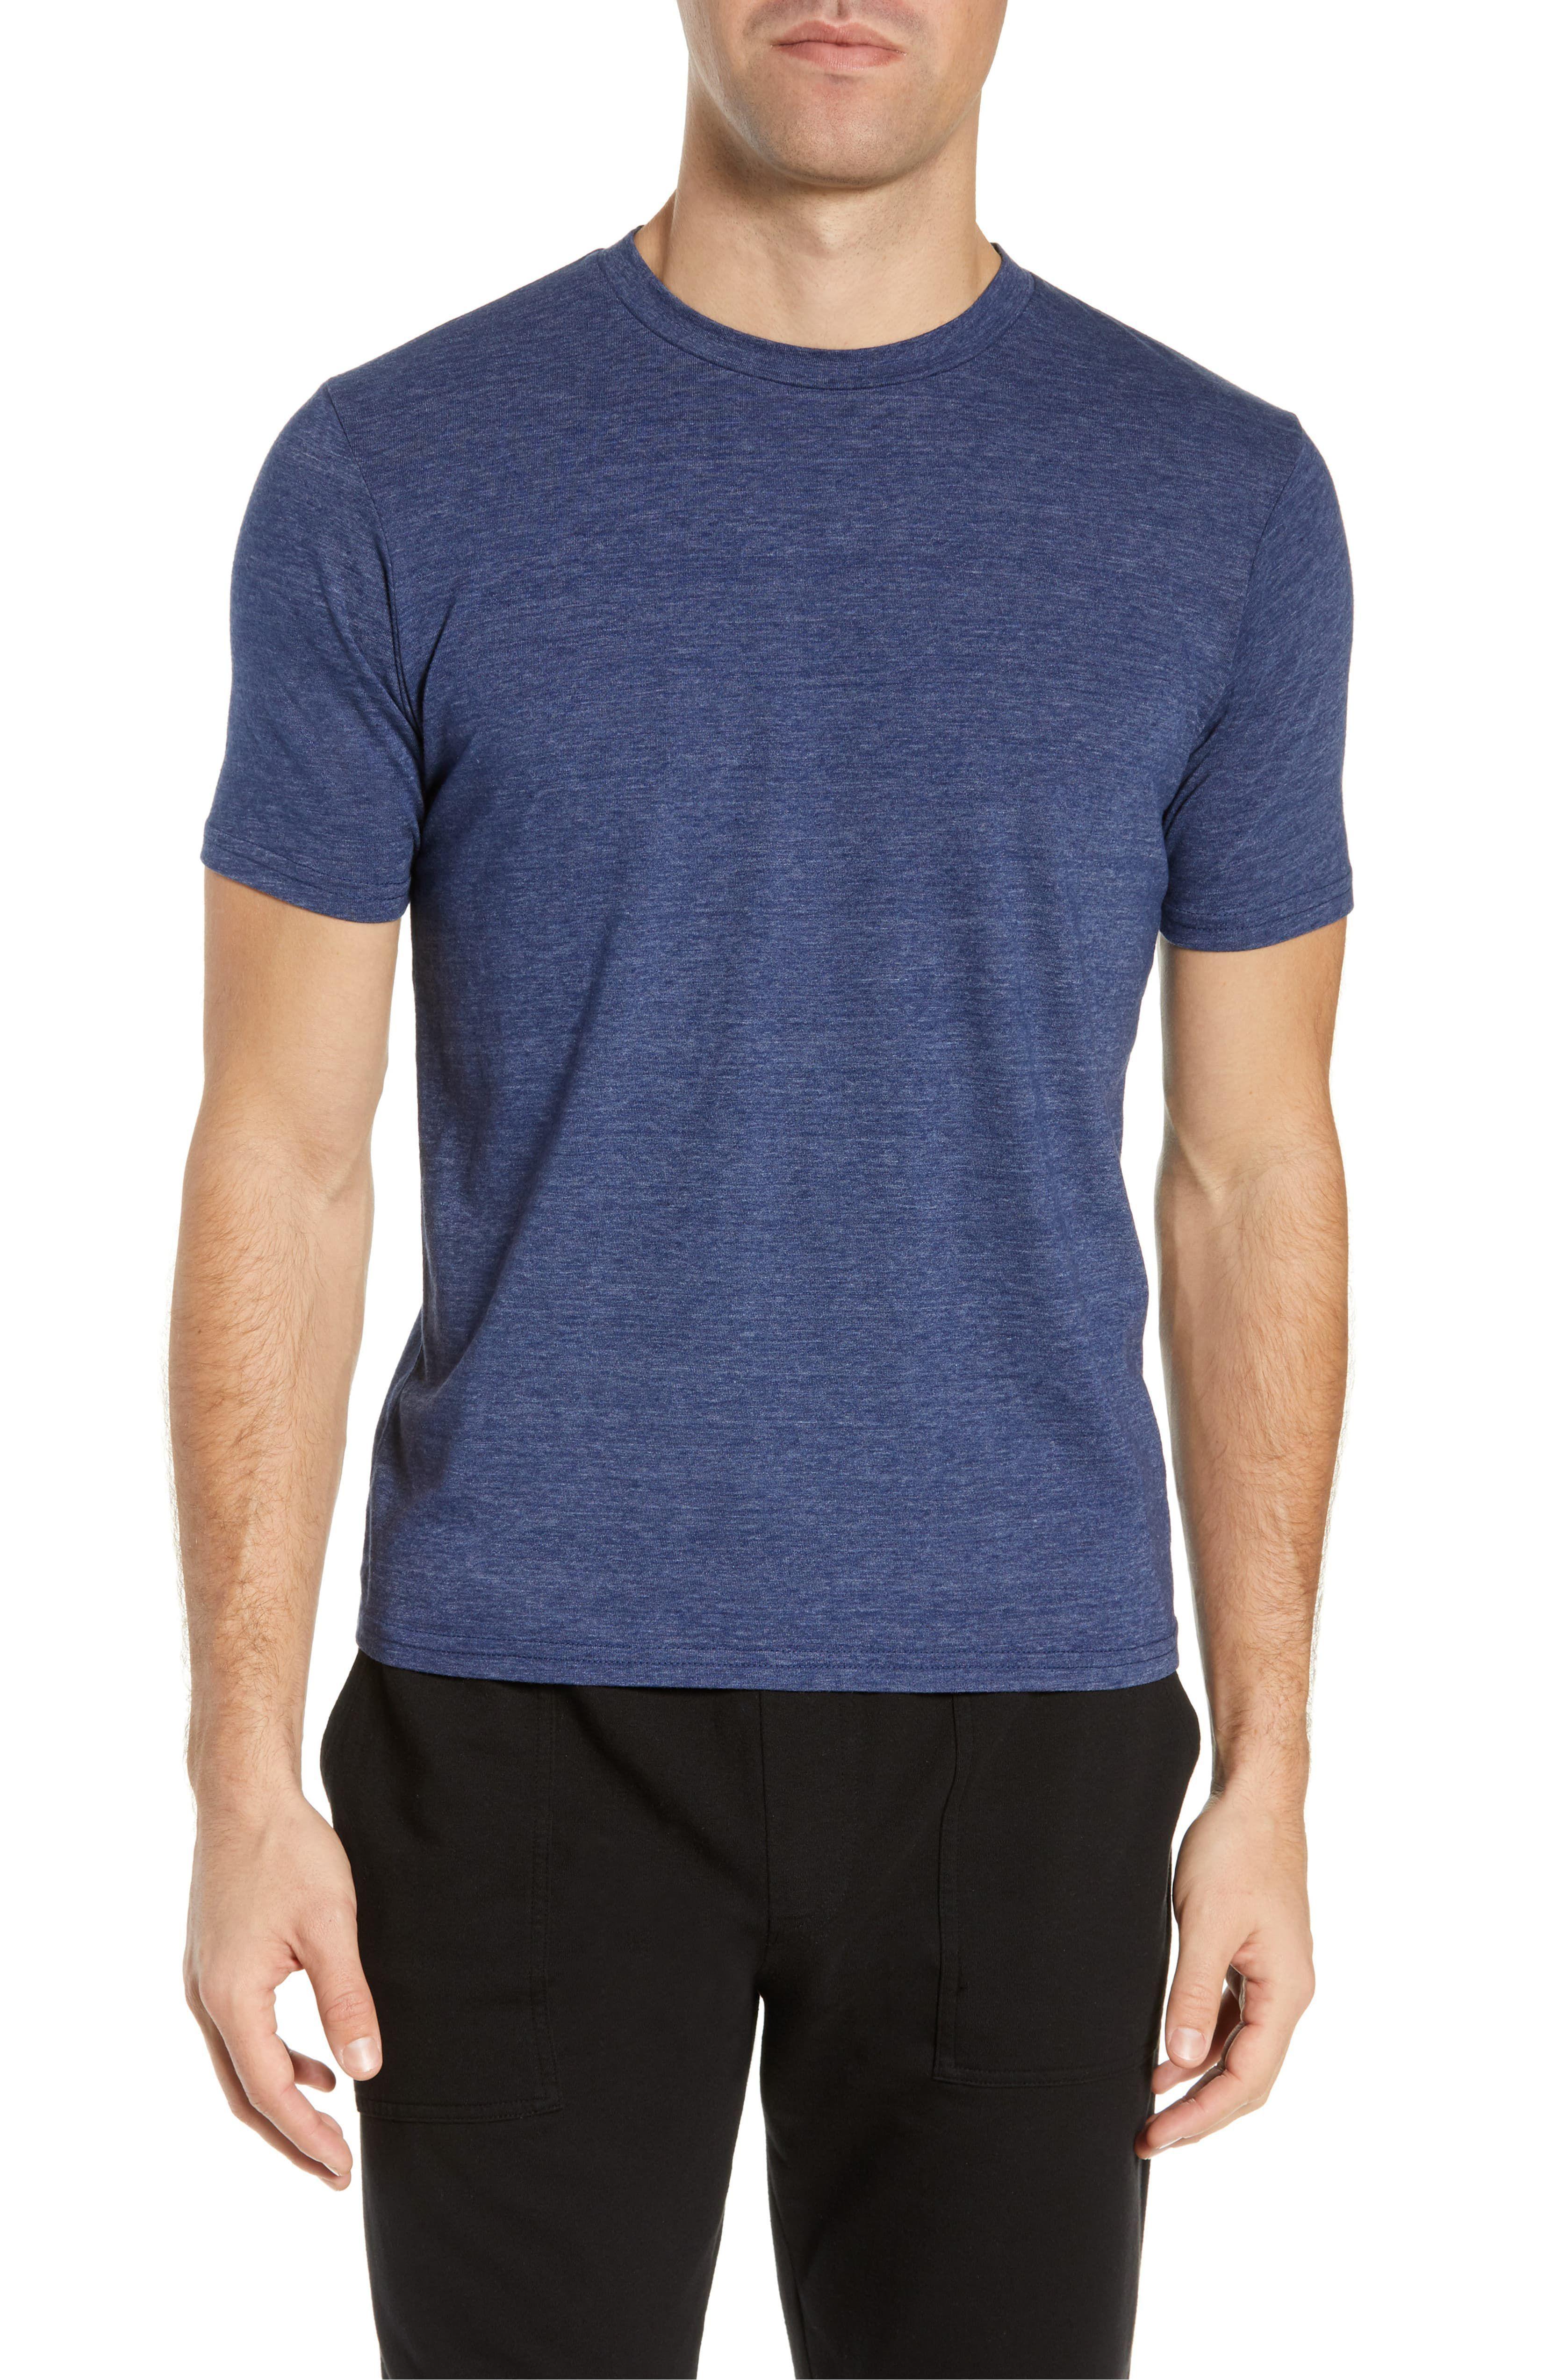 98f7c47b 14 Best Men's Summer Shirts 2019 - Casual Preppy Summer Shirts for Men